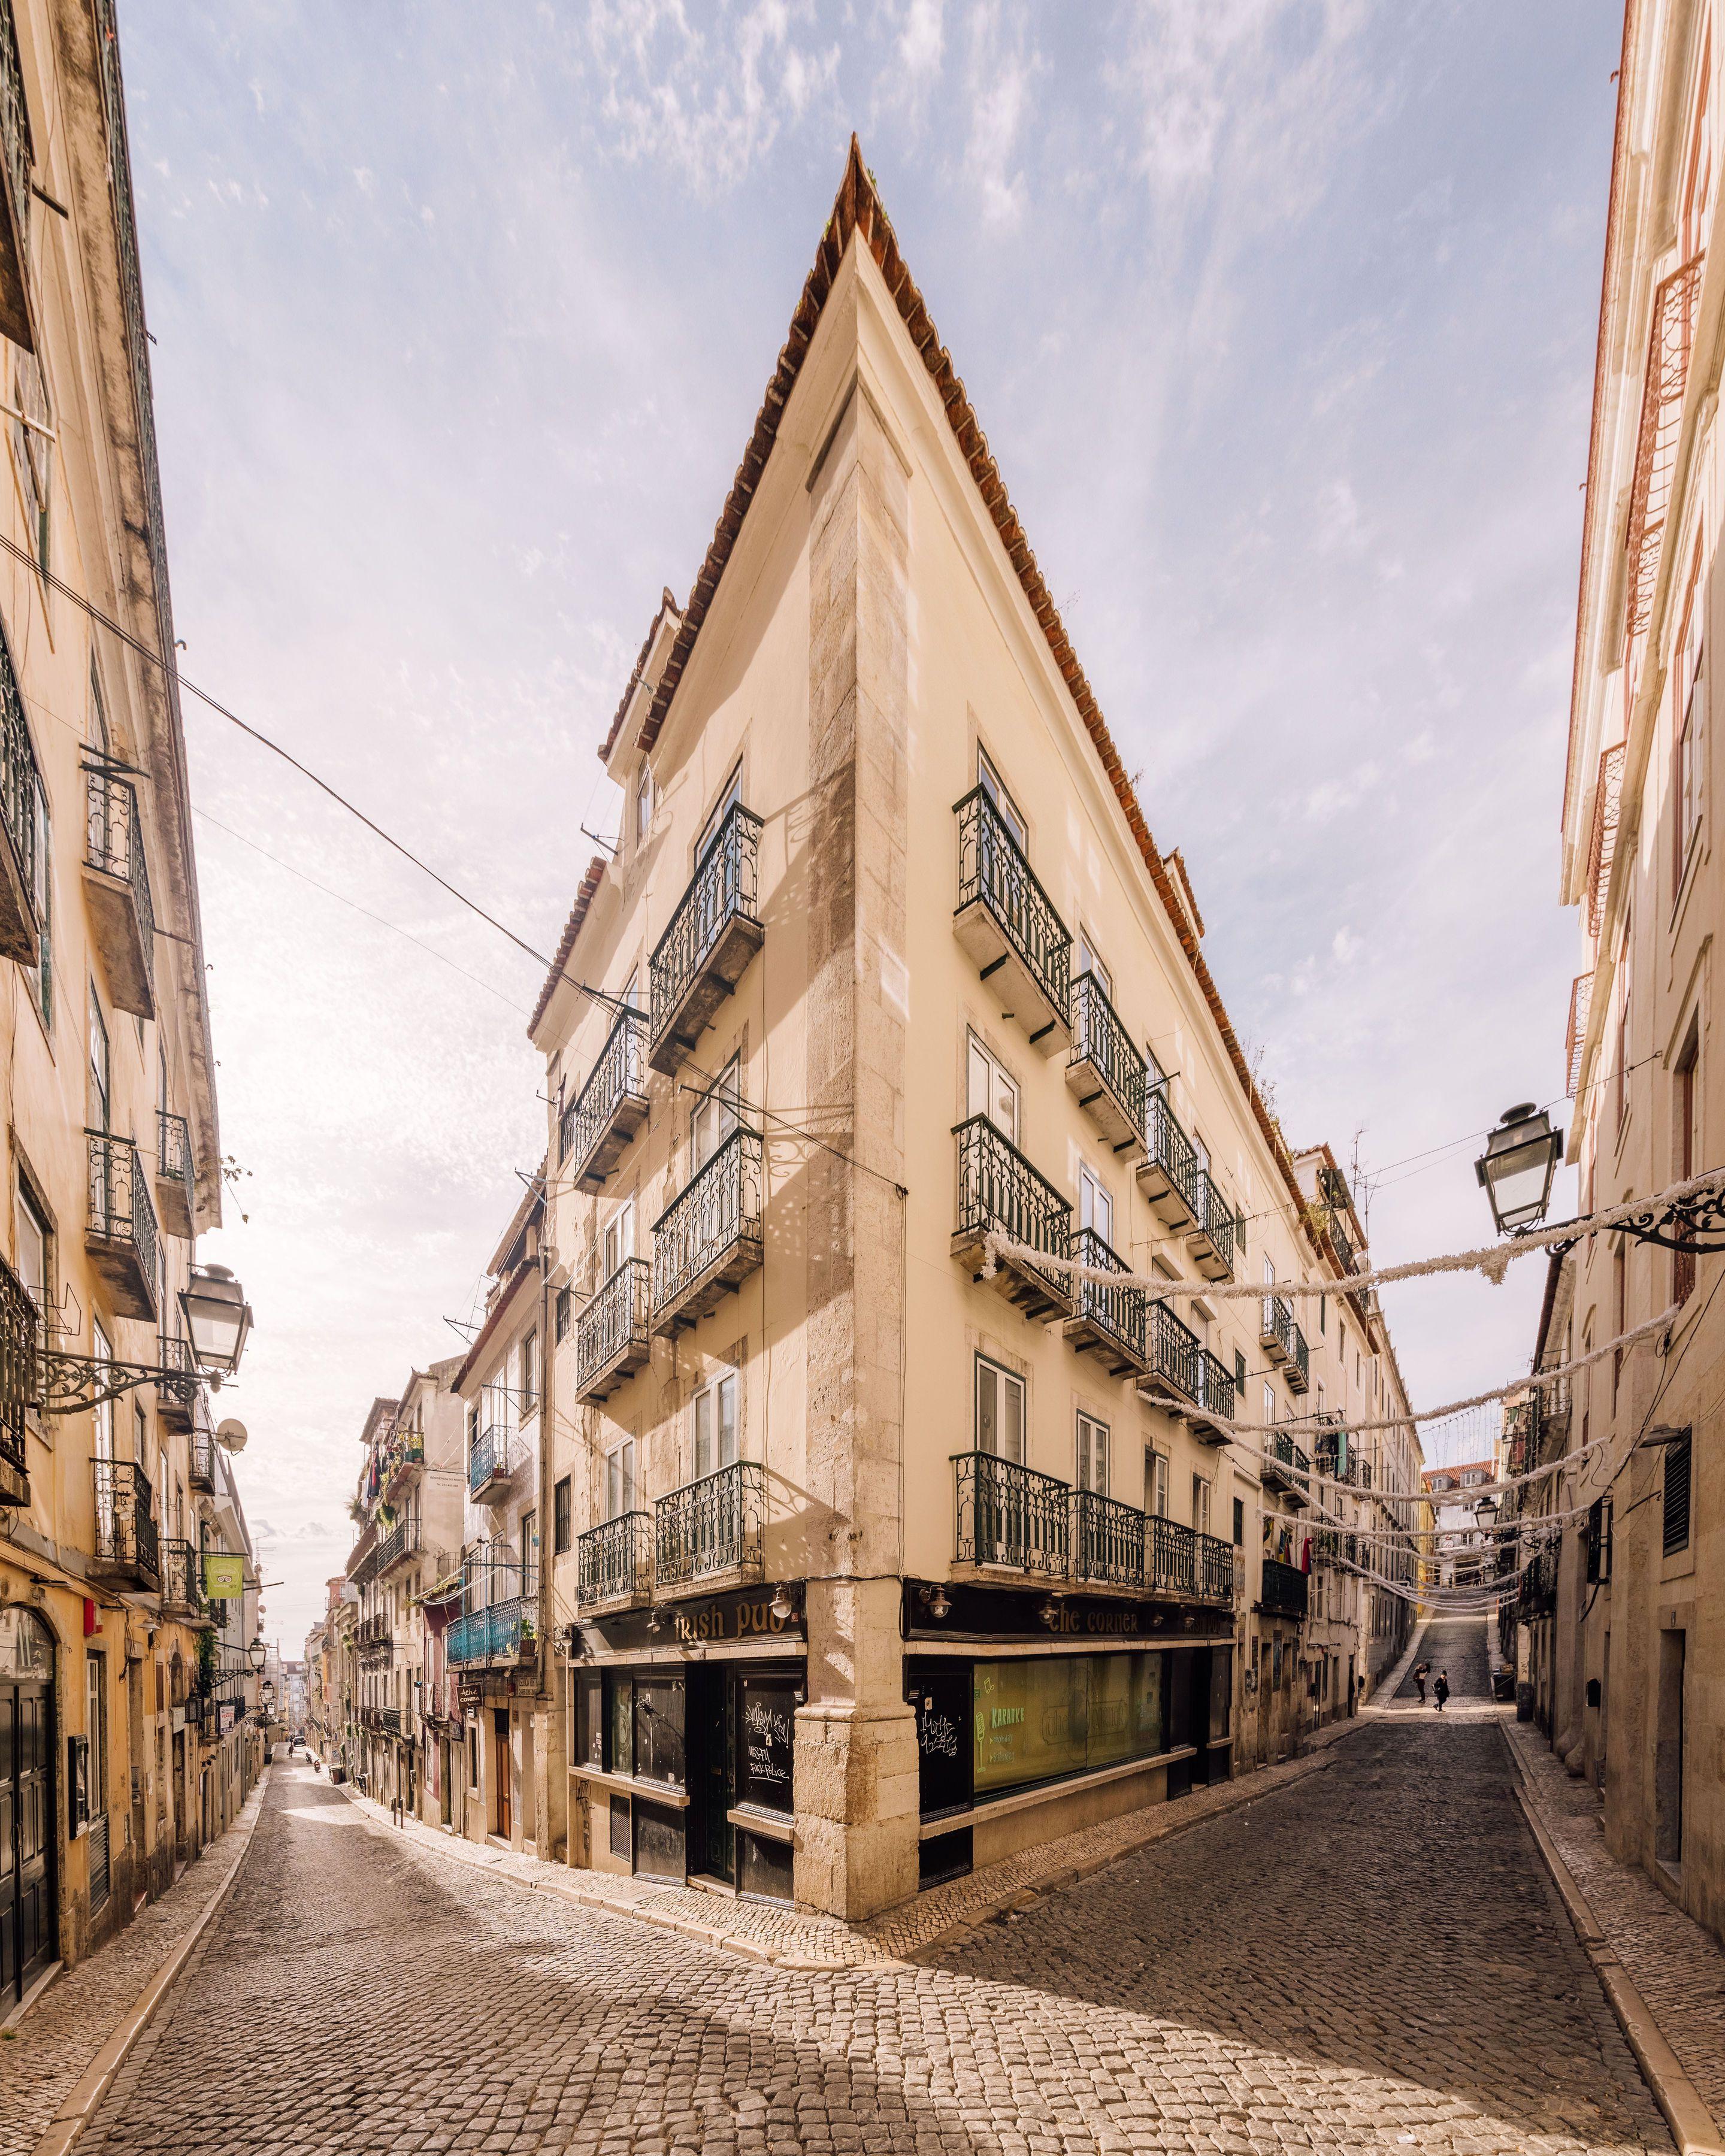 The Top 8 Attractions in Bairro Alto, Lisbon